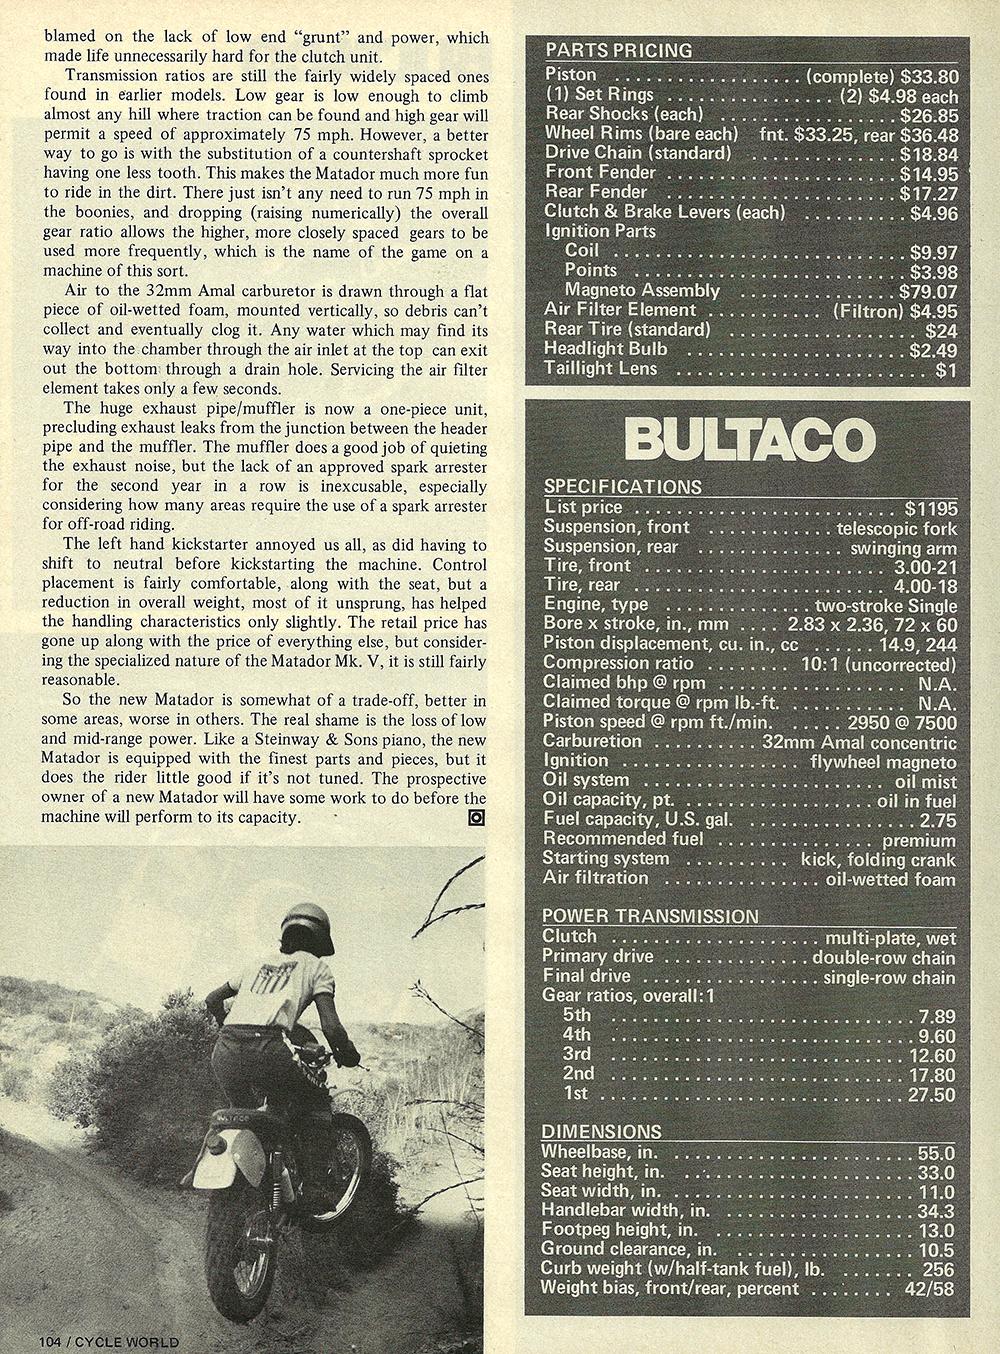 1974 Bultaco Matador 250 Mark 5 road test 05.jpg